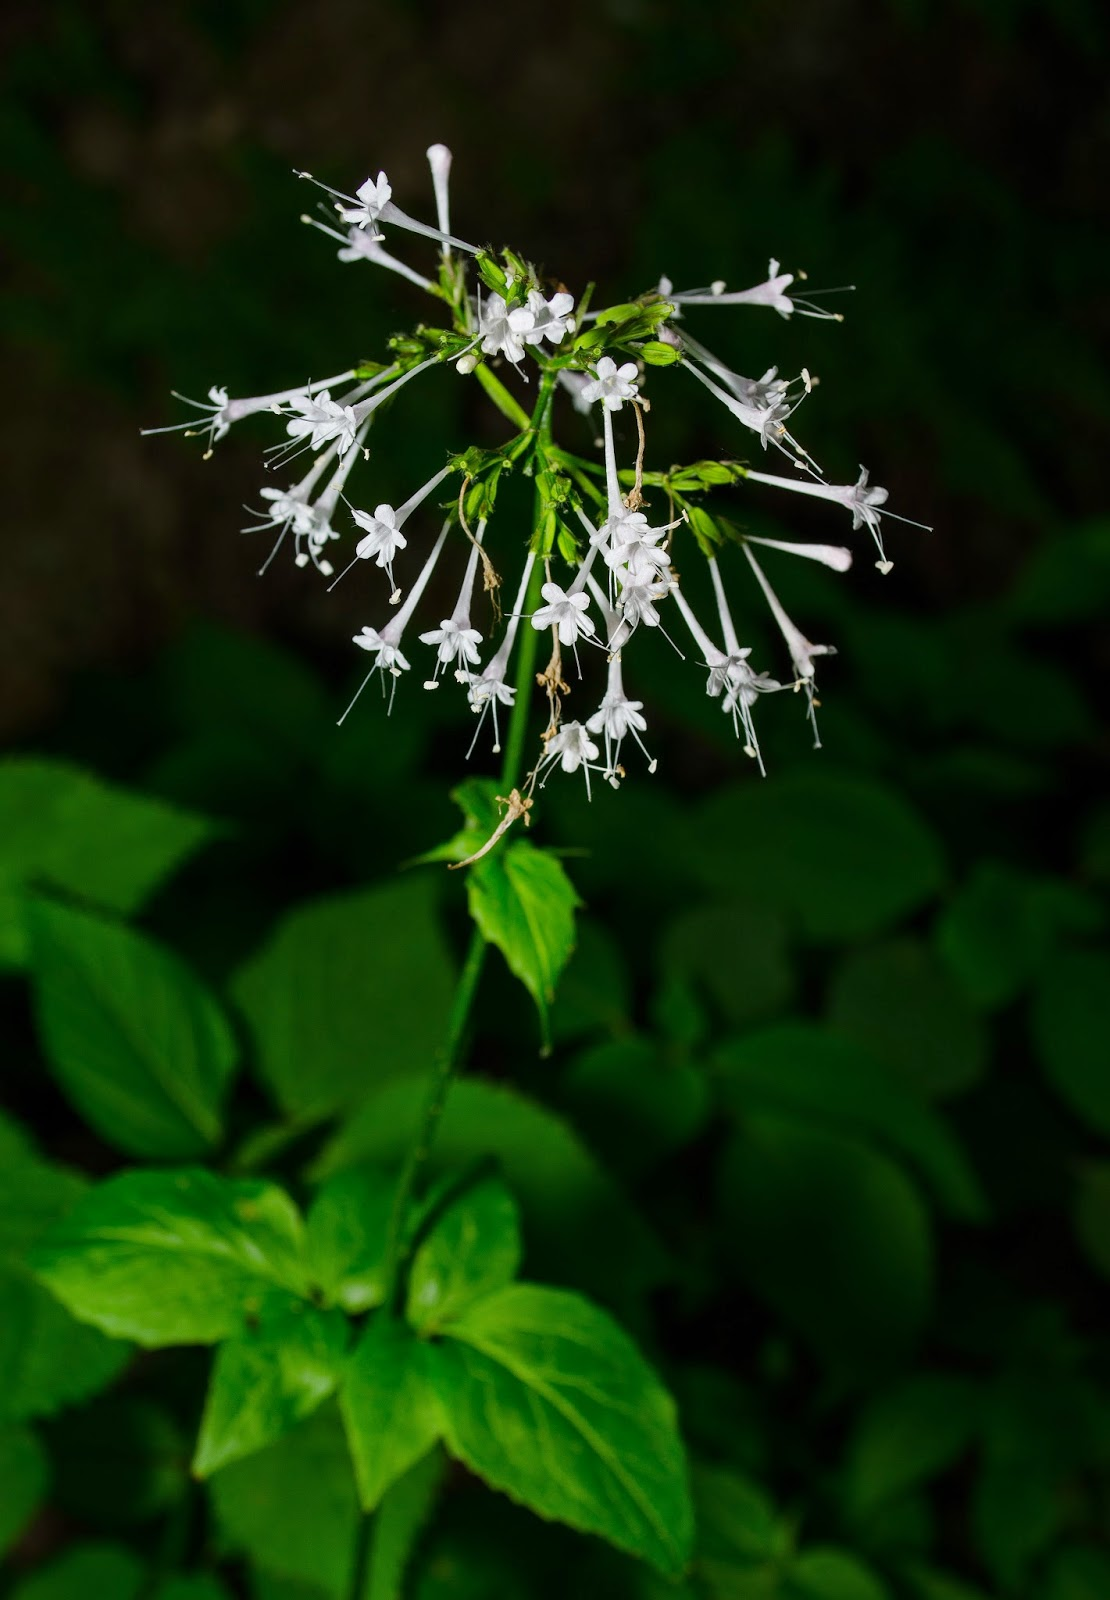 Large-Flowered Valerian, Valeriana pauciflora